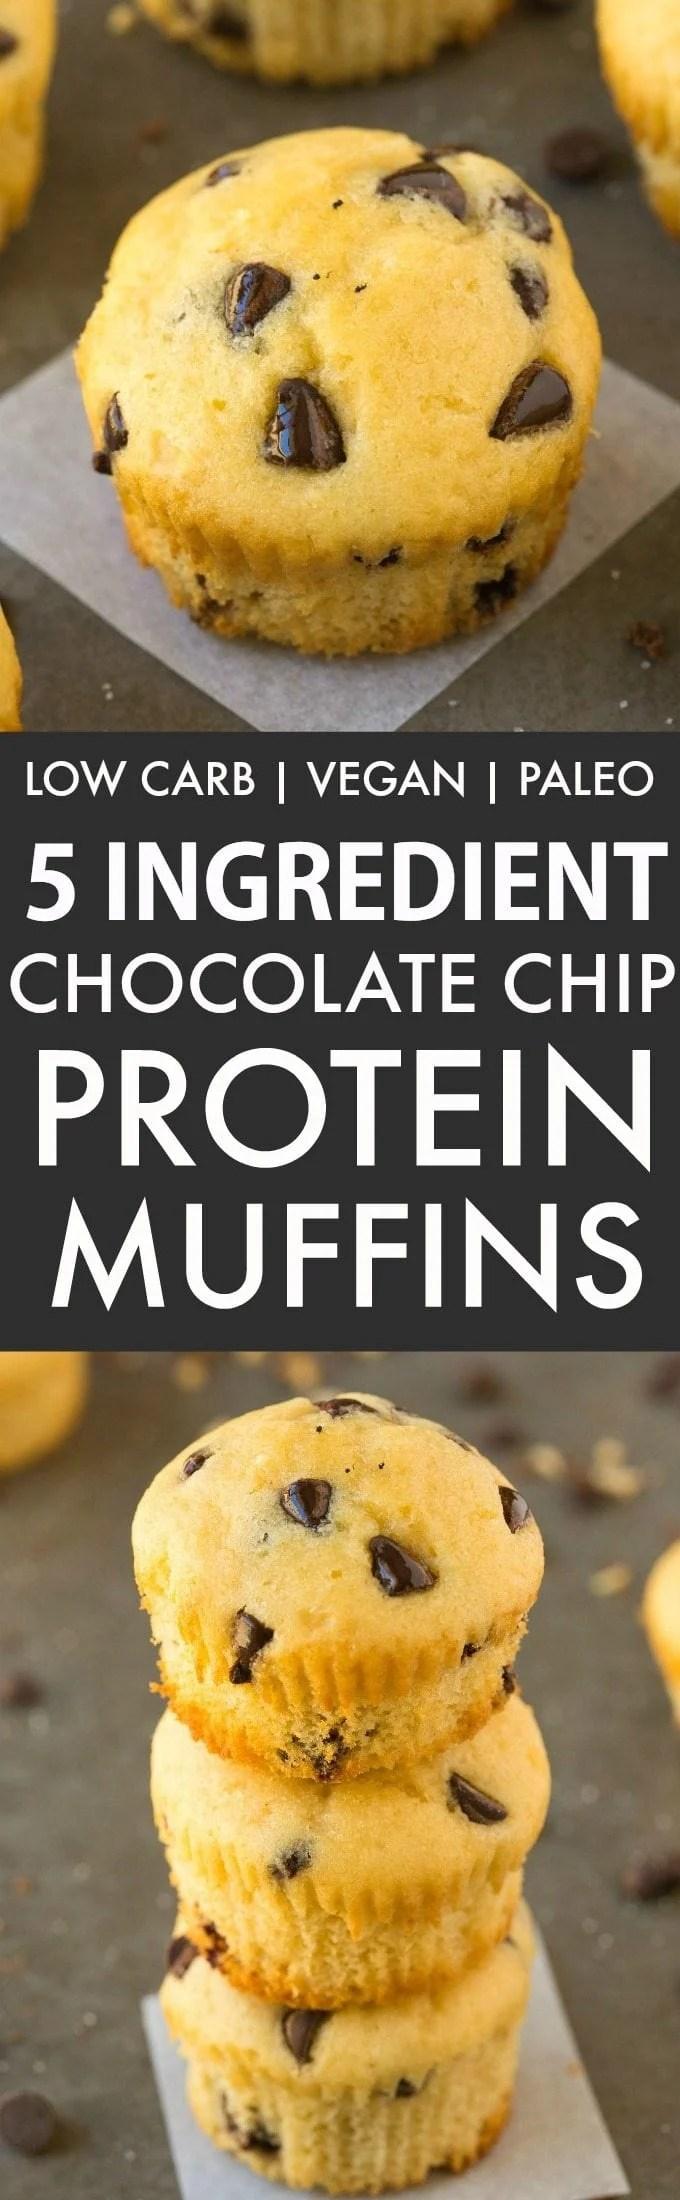 5 Ingredient Chocolate Chip Protein Muffins (Low Carb, Vegan, Paleo)